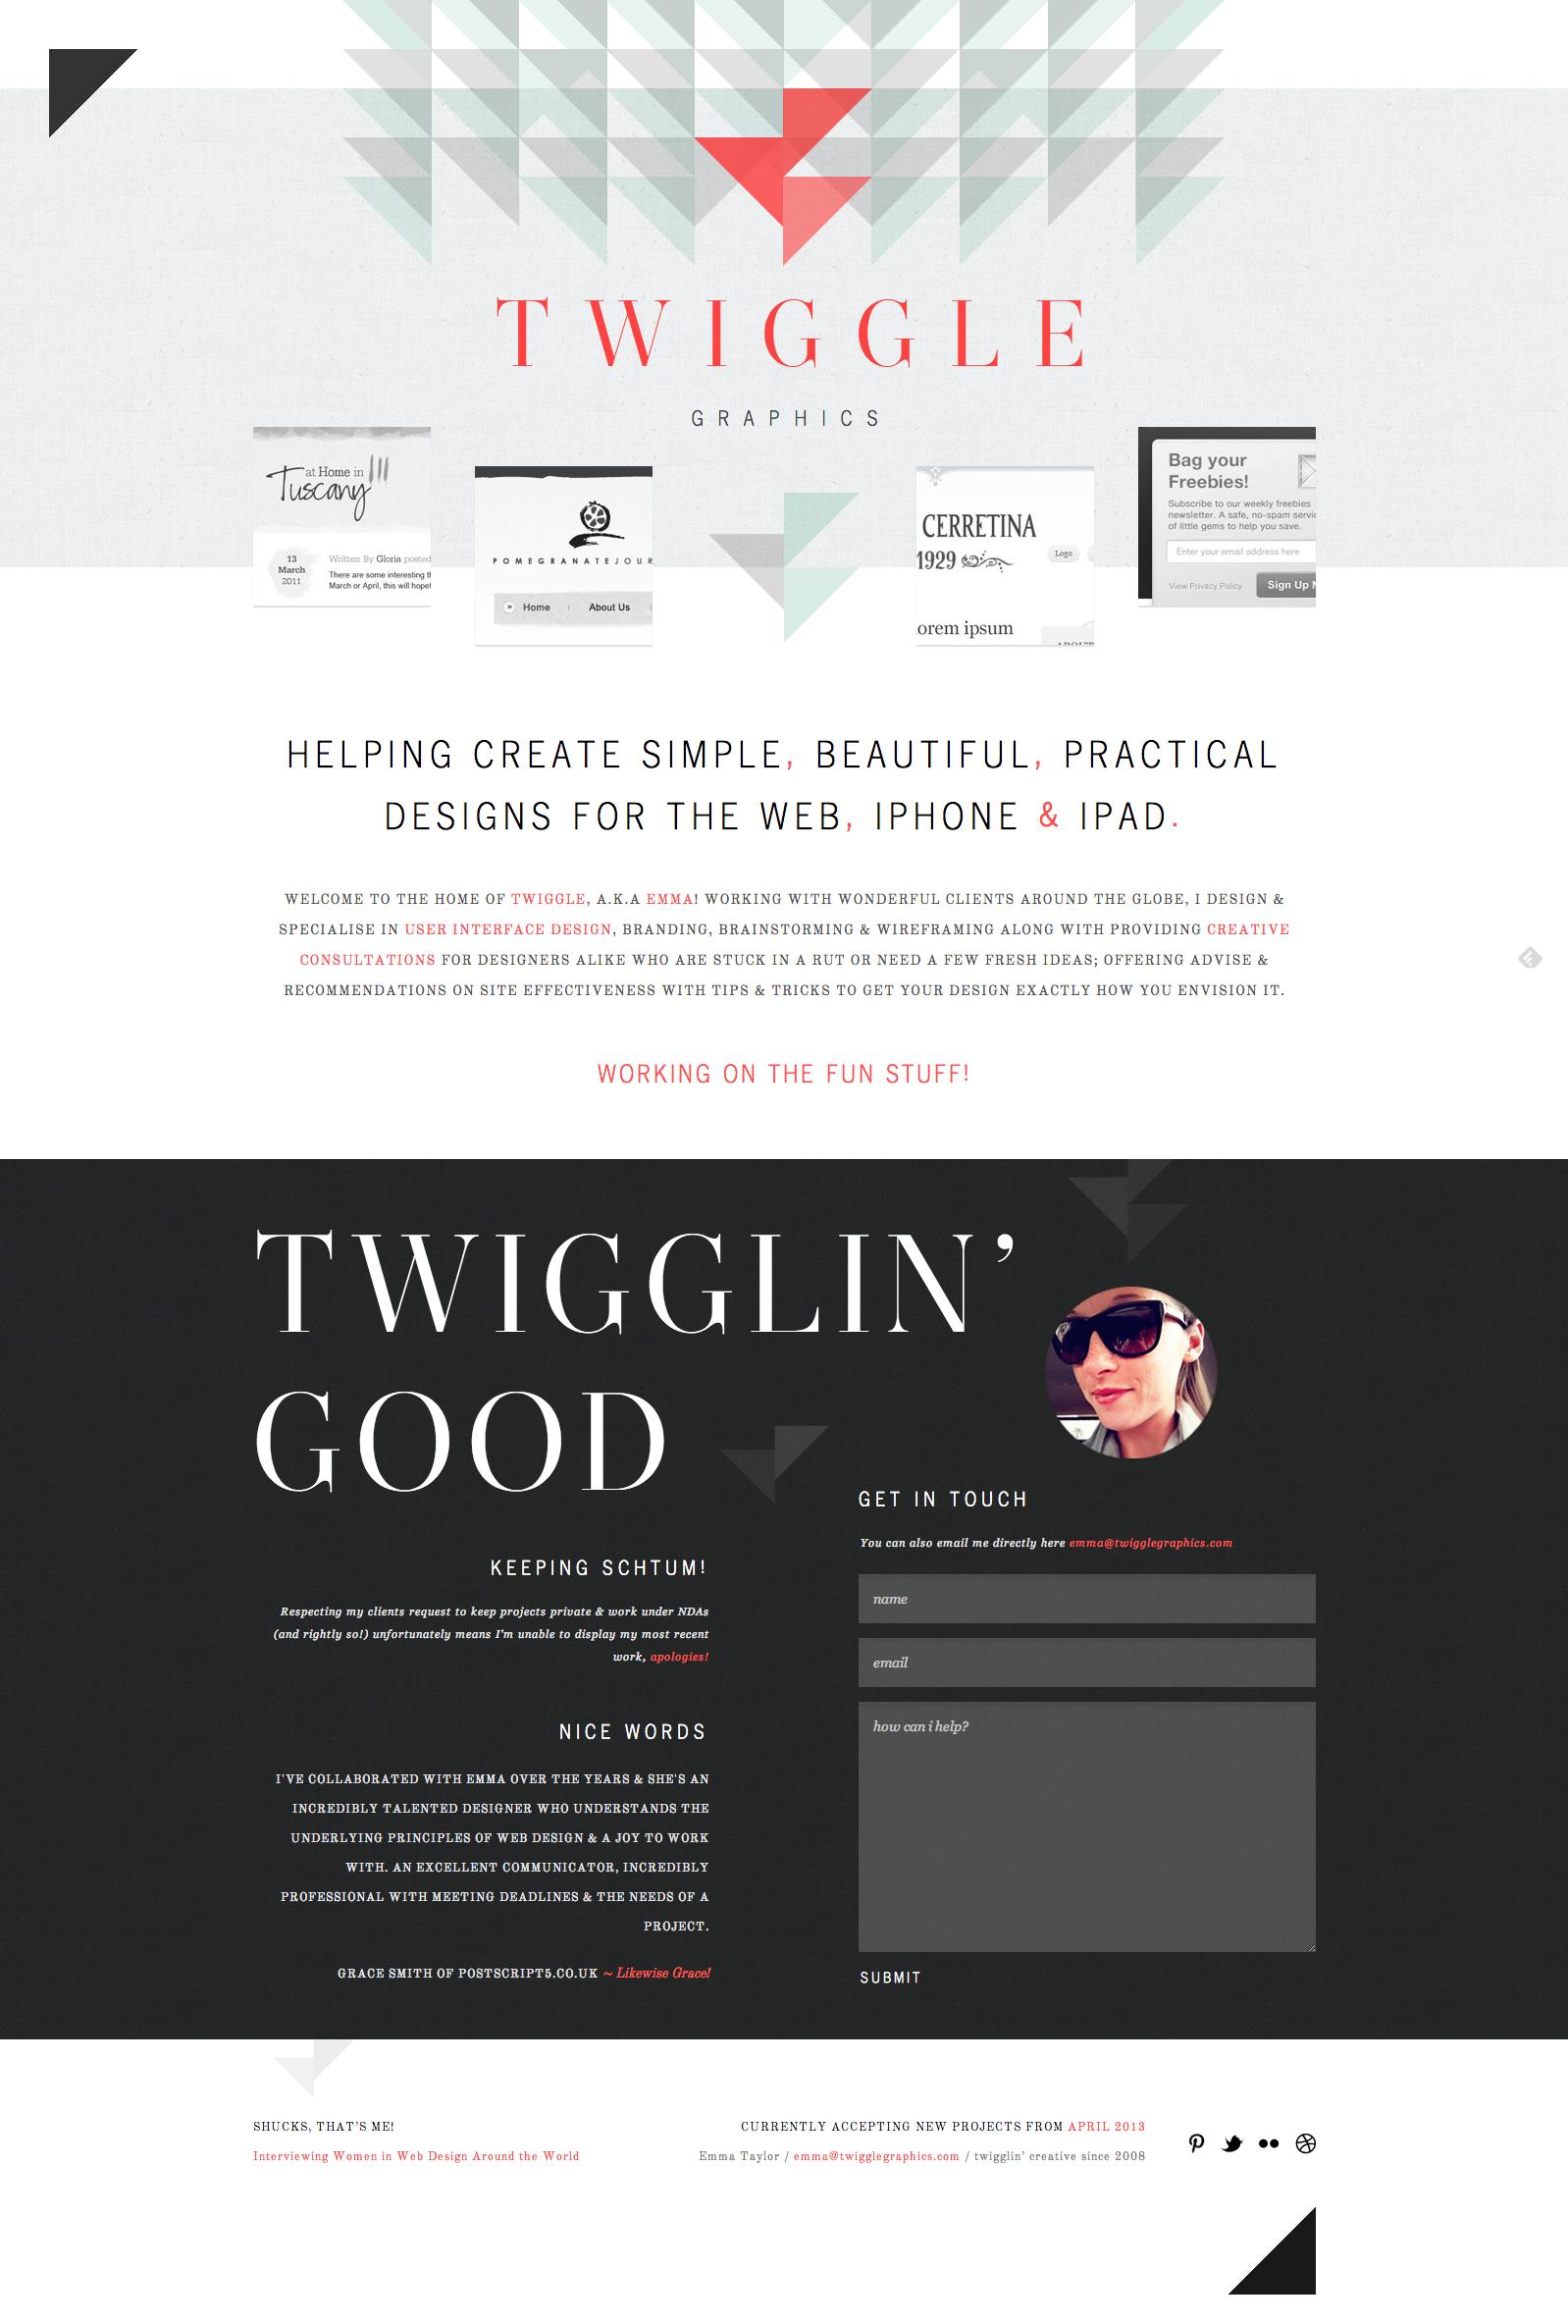 Twiggle Graphics|21030422